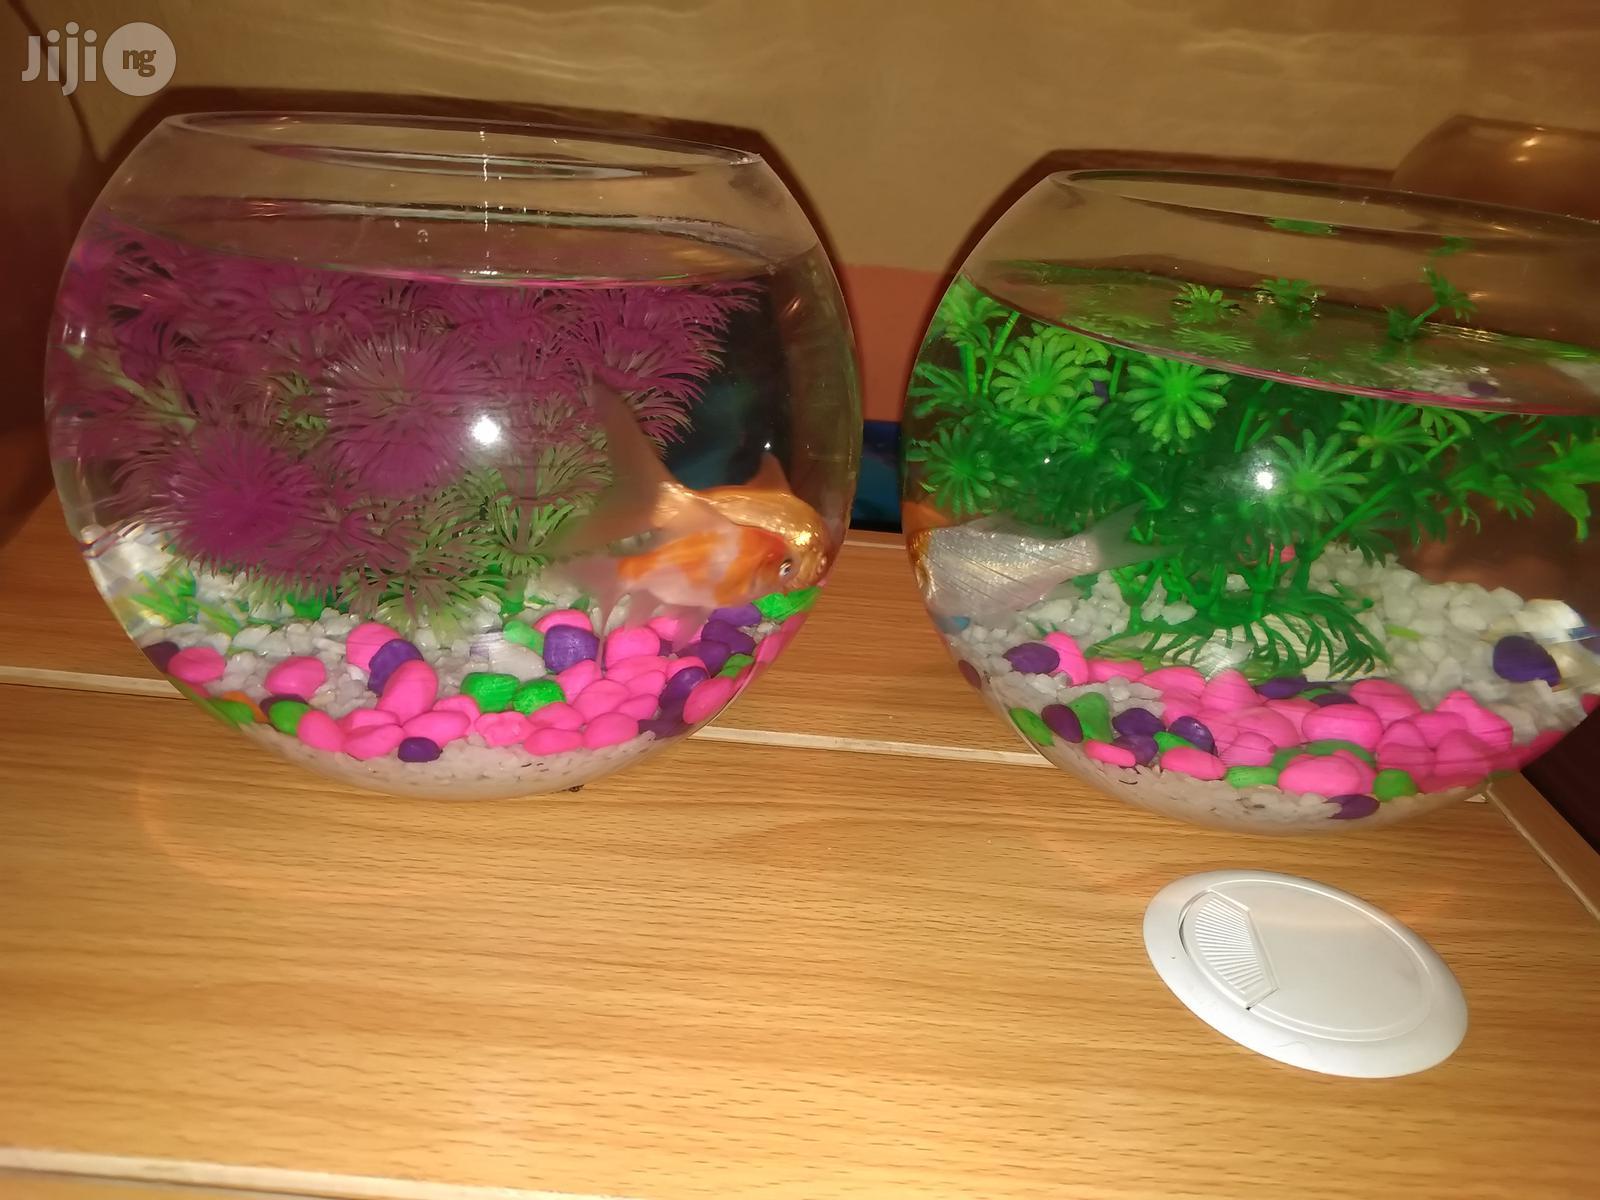 Fish Bowl Mini Aquarium | Fish for sale in Ikoyi, Lagos State, Nigeria